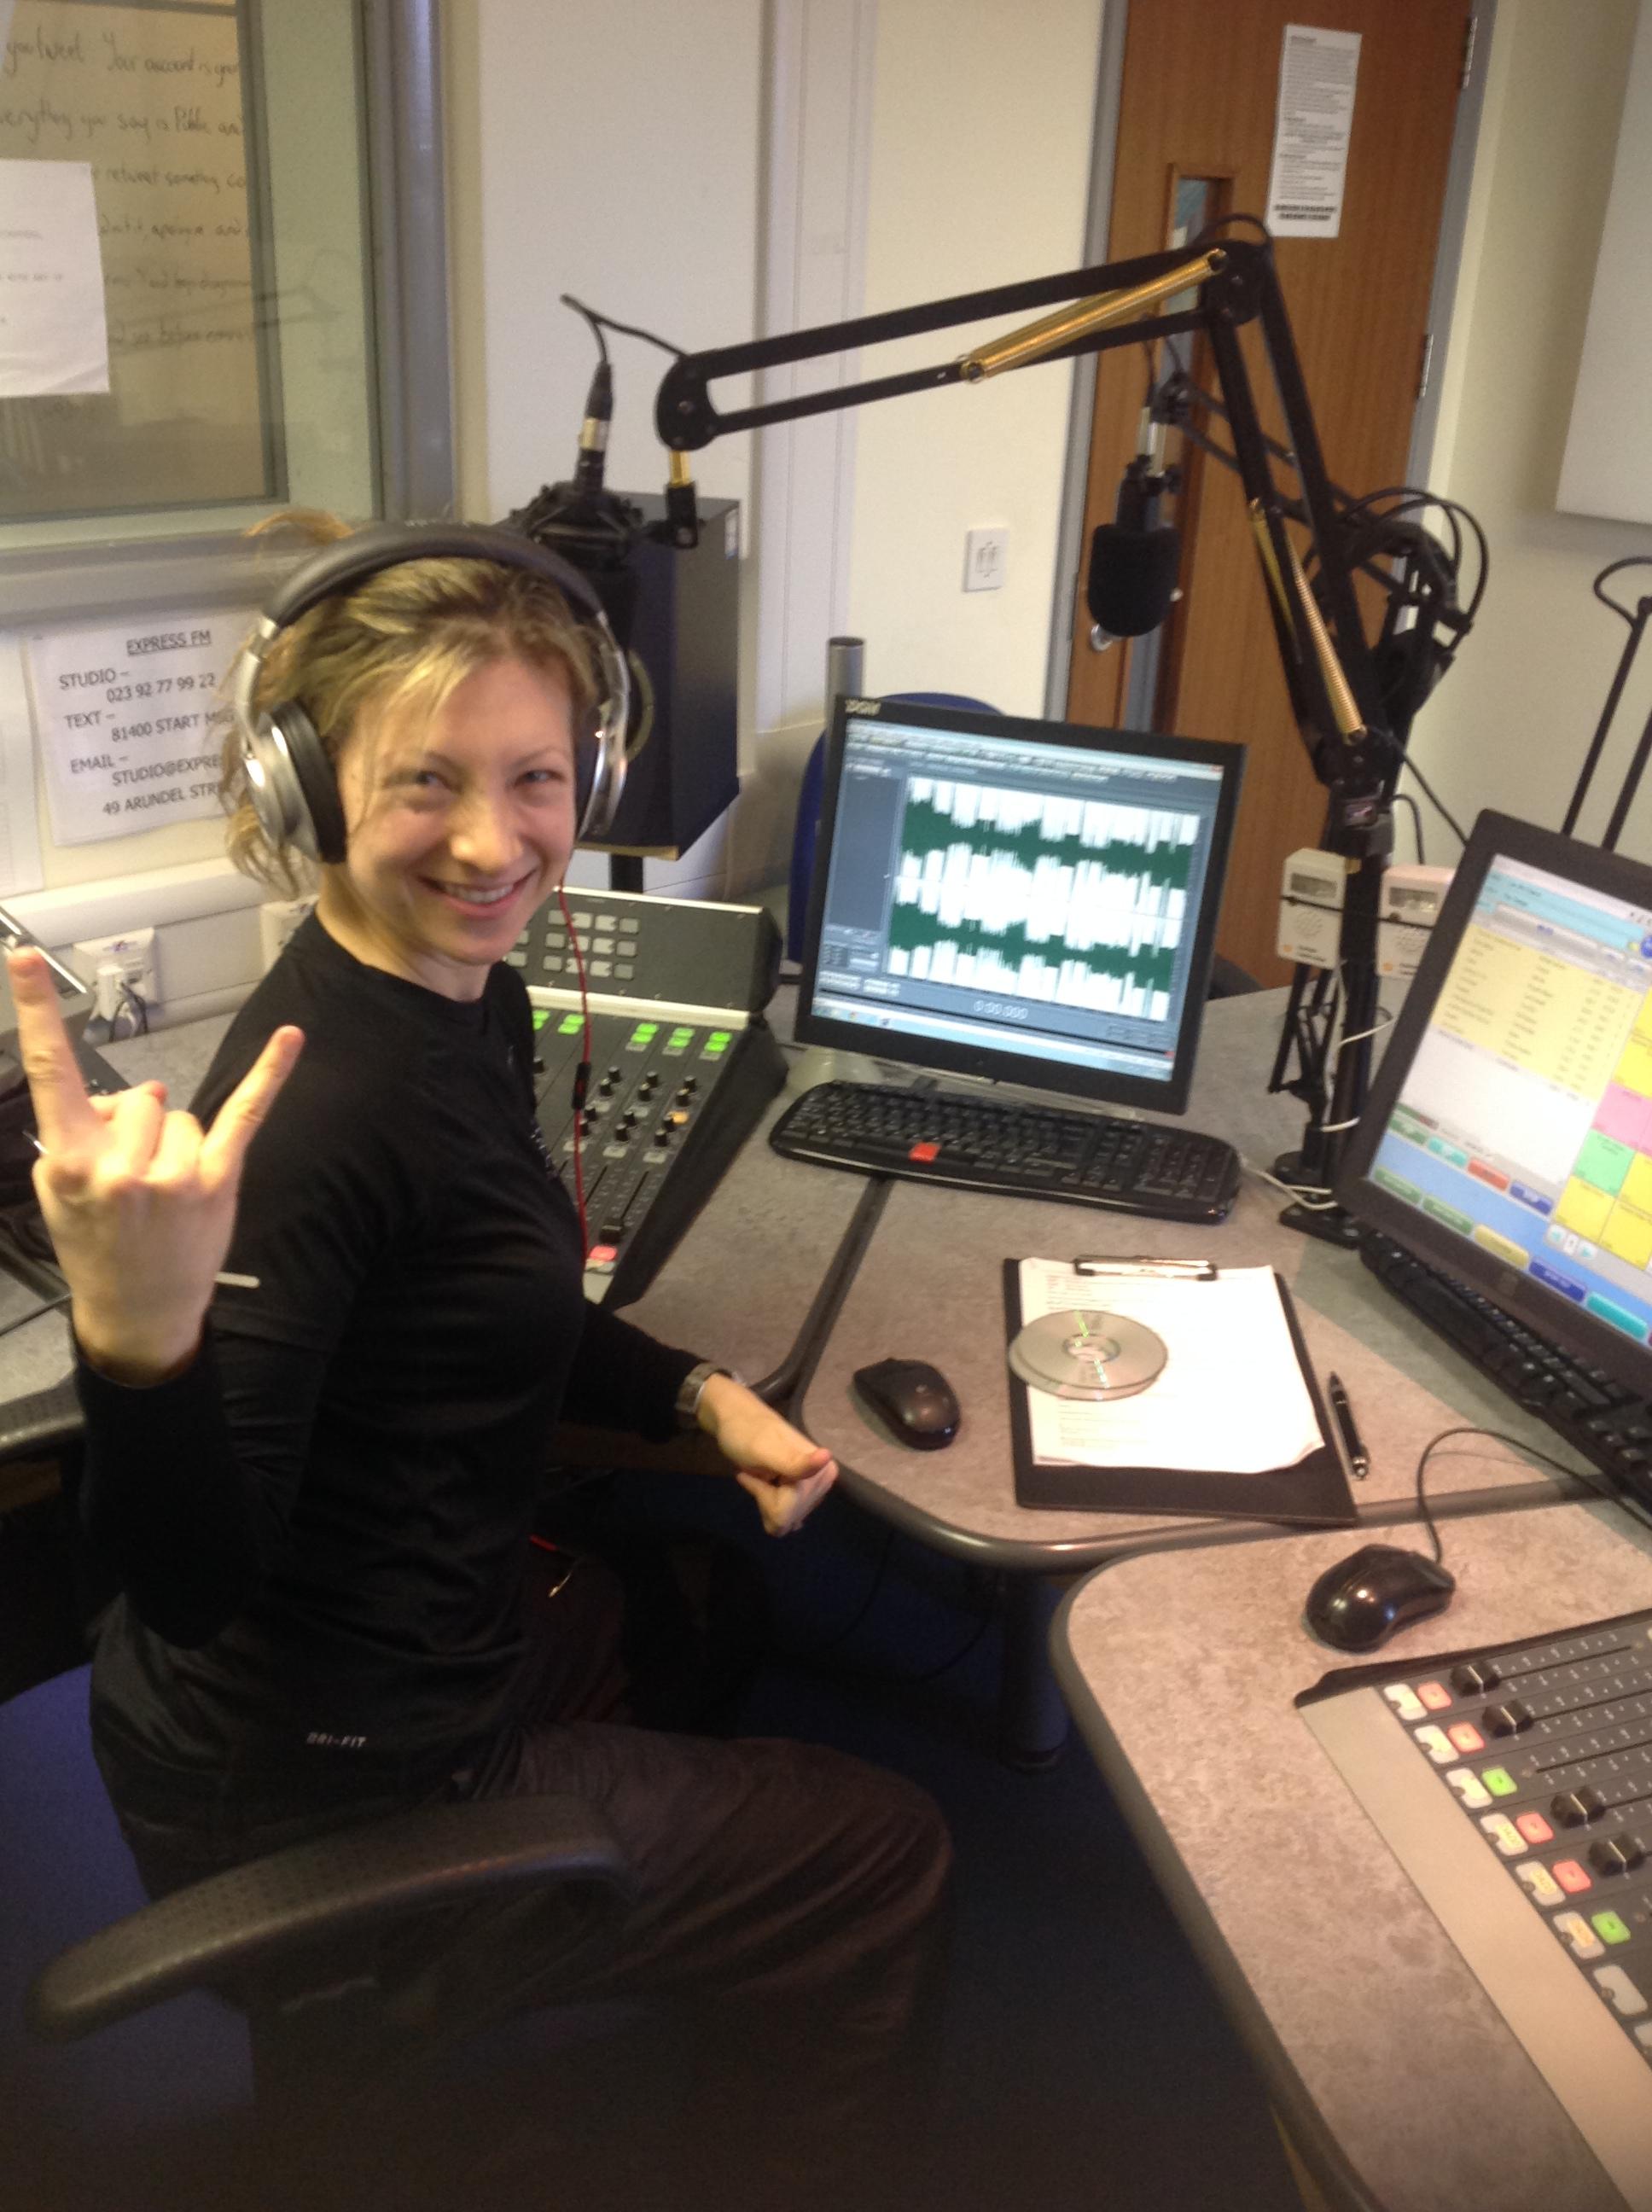 Back on 93.7 Express FM: fads, fitness…and Jason Donovan!